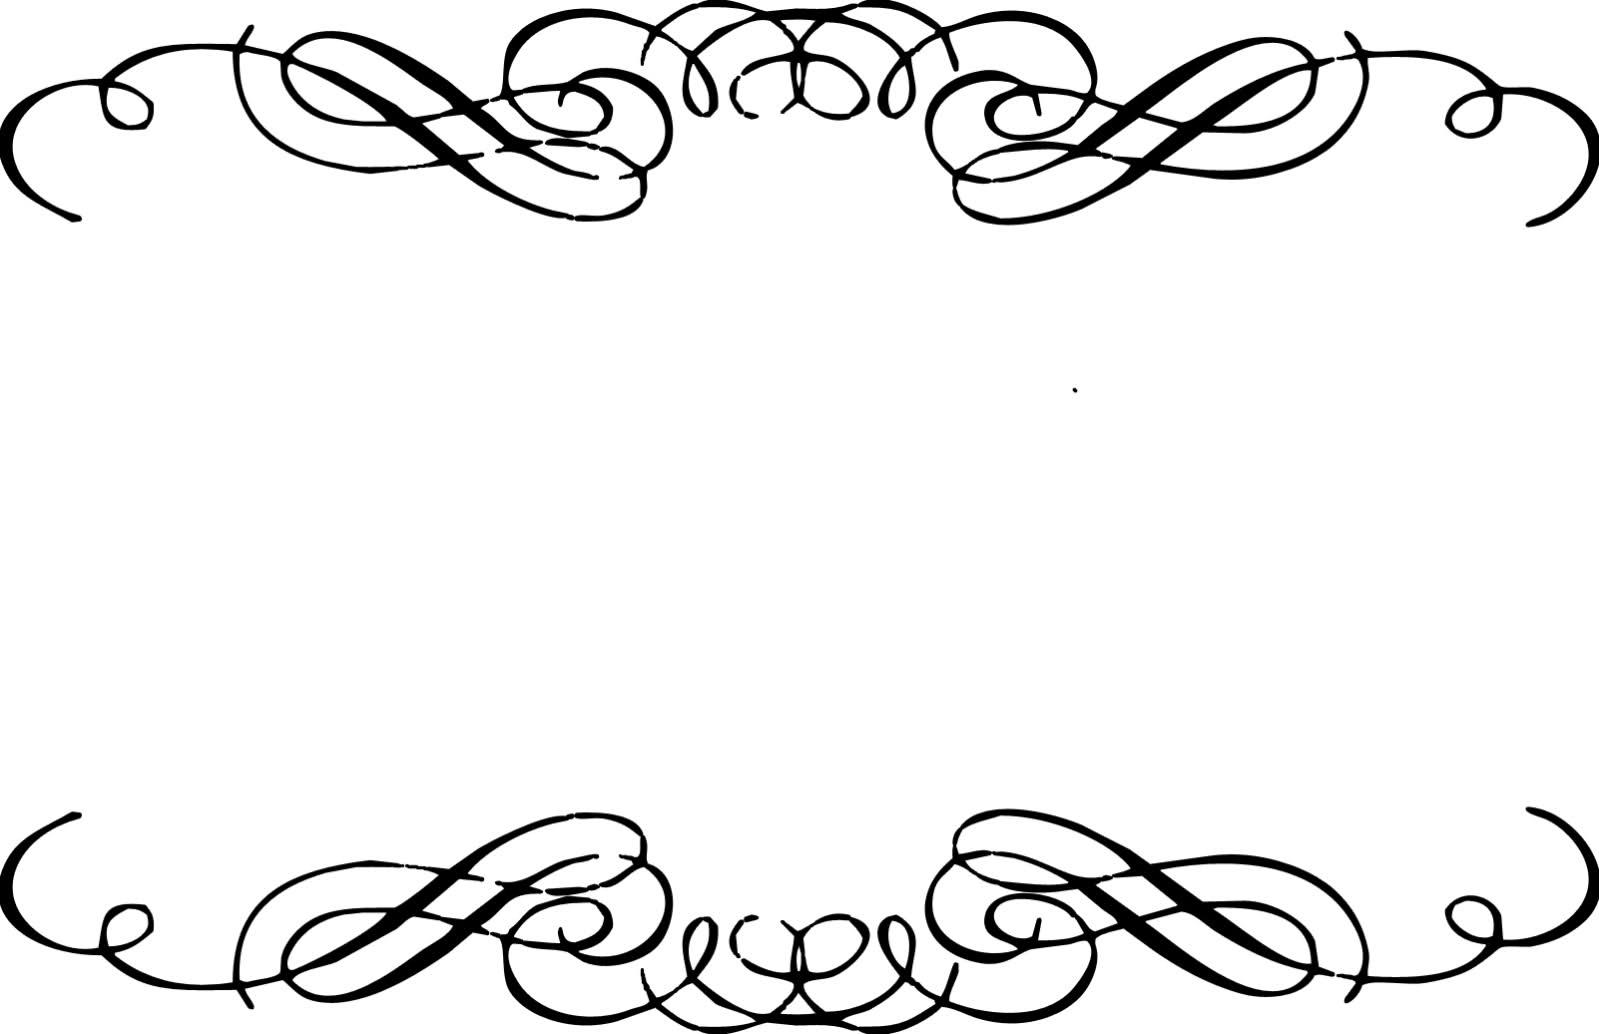 Scroll Lines Clip Art - ClipArt Best